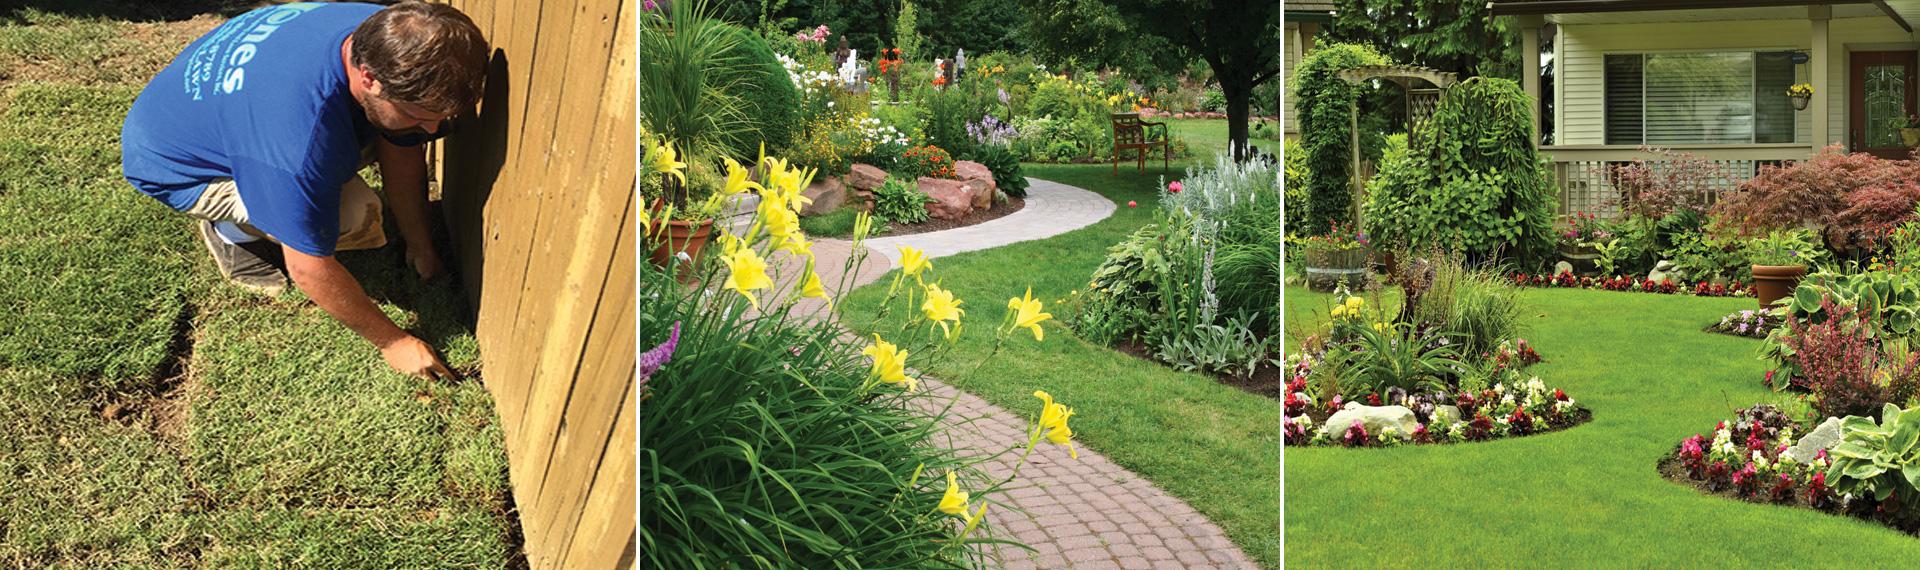 Jones Landscaping & Lawn Services INC Cabot AR